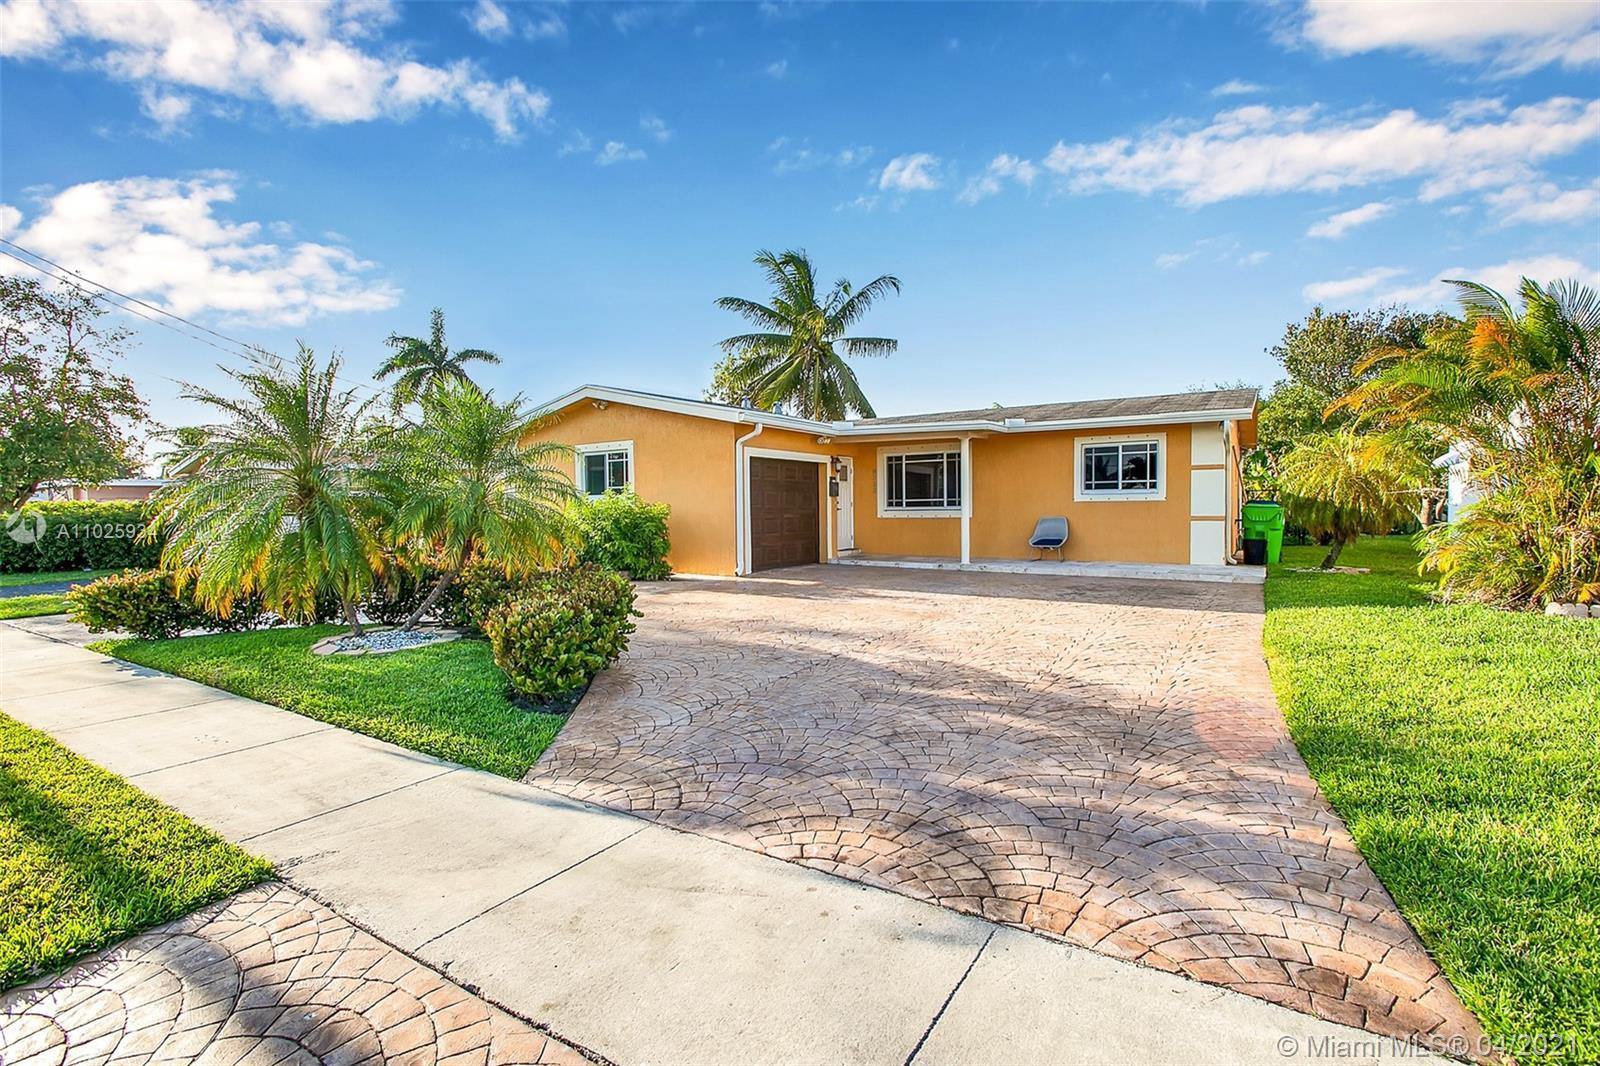 Sunrise Golf Village - 8353 NW 26th Pl, Sunrise, FL 33322